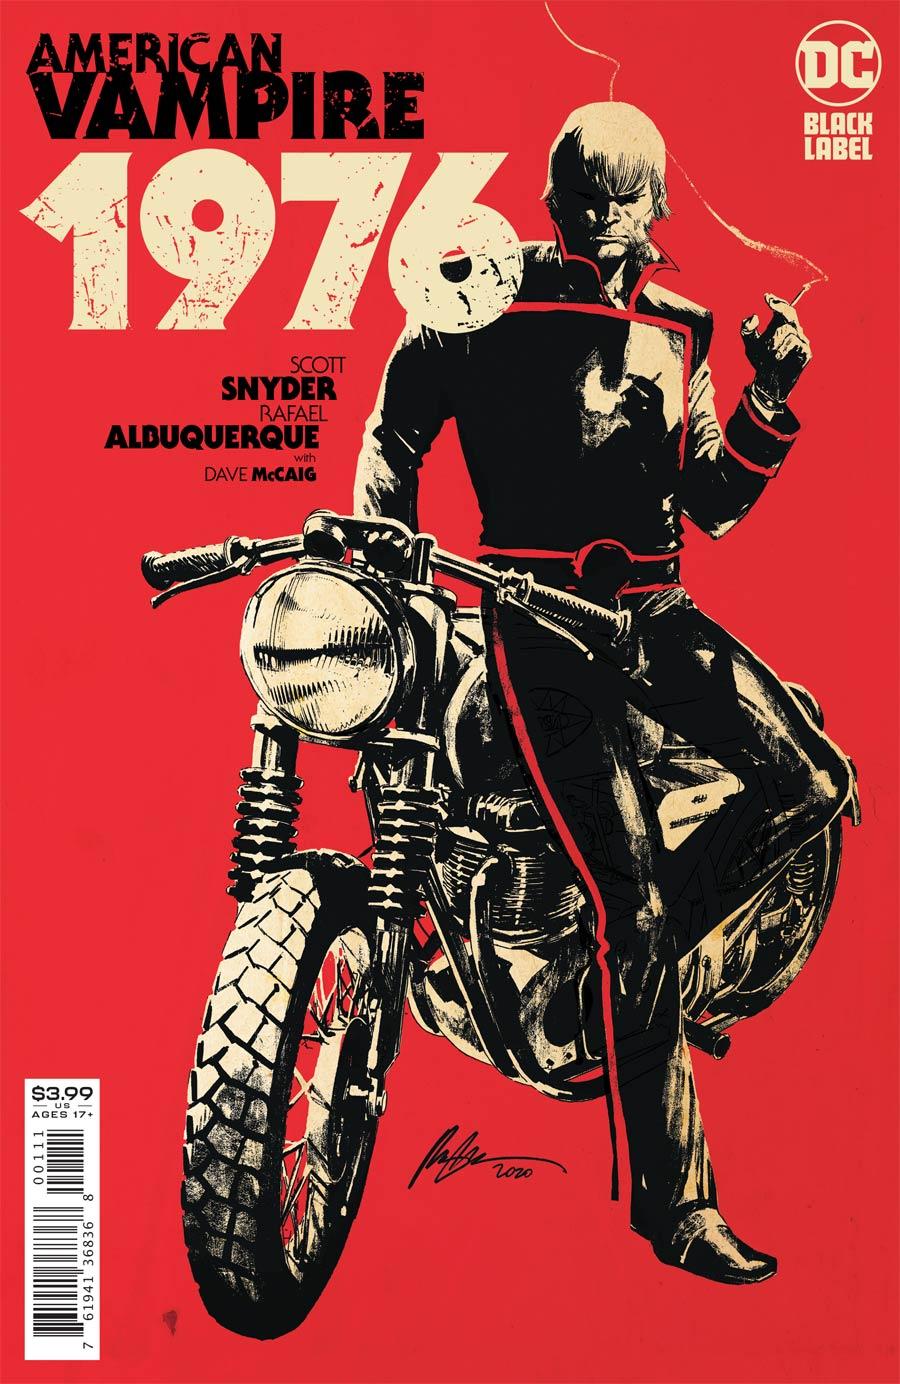 American Vampire 1976 #1 (2020)